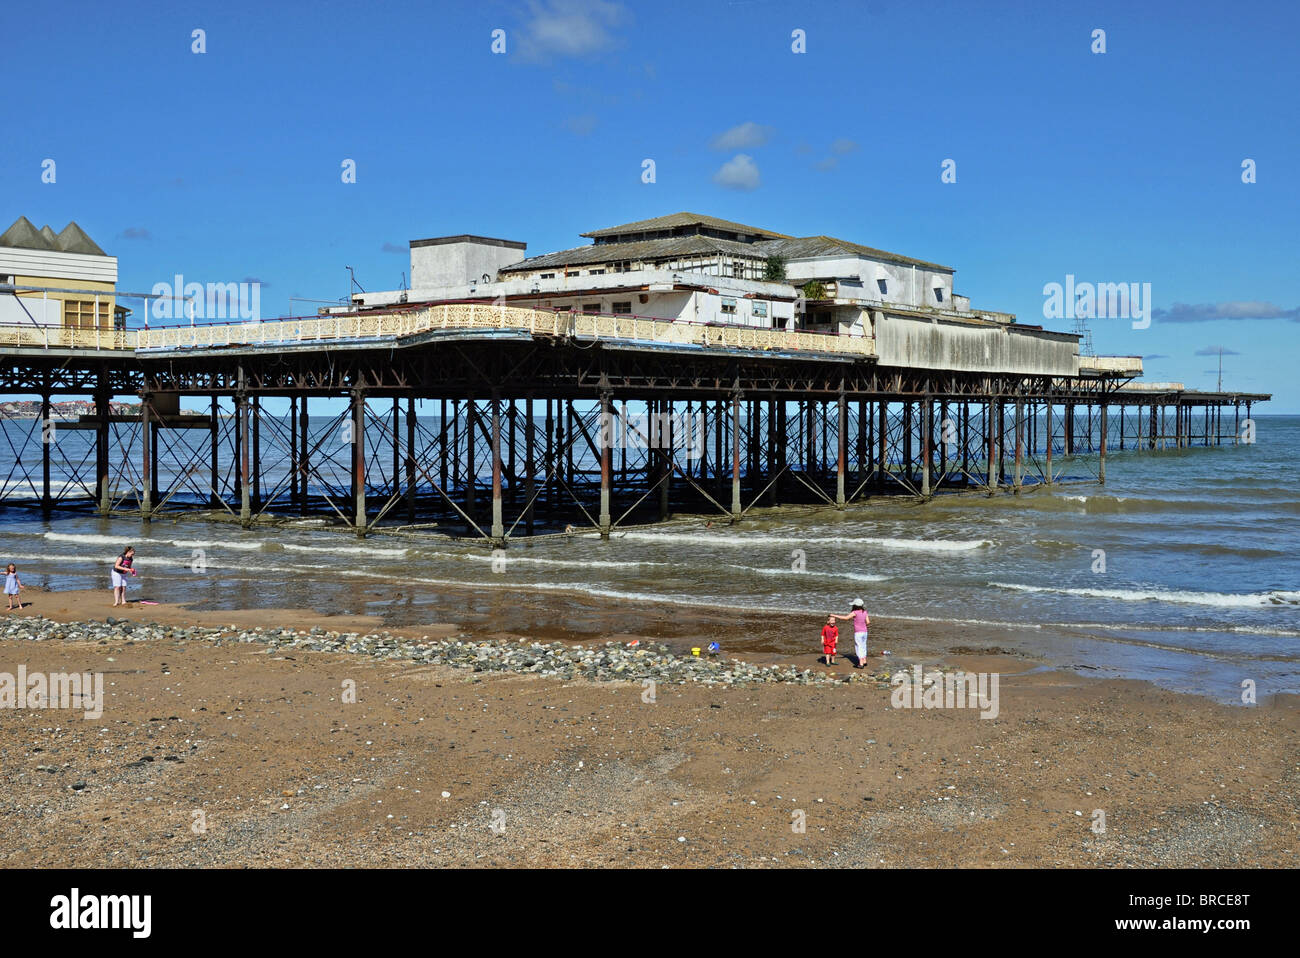 Victoria Pier,Colwyn Bay, North Wales - Stock Image